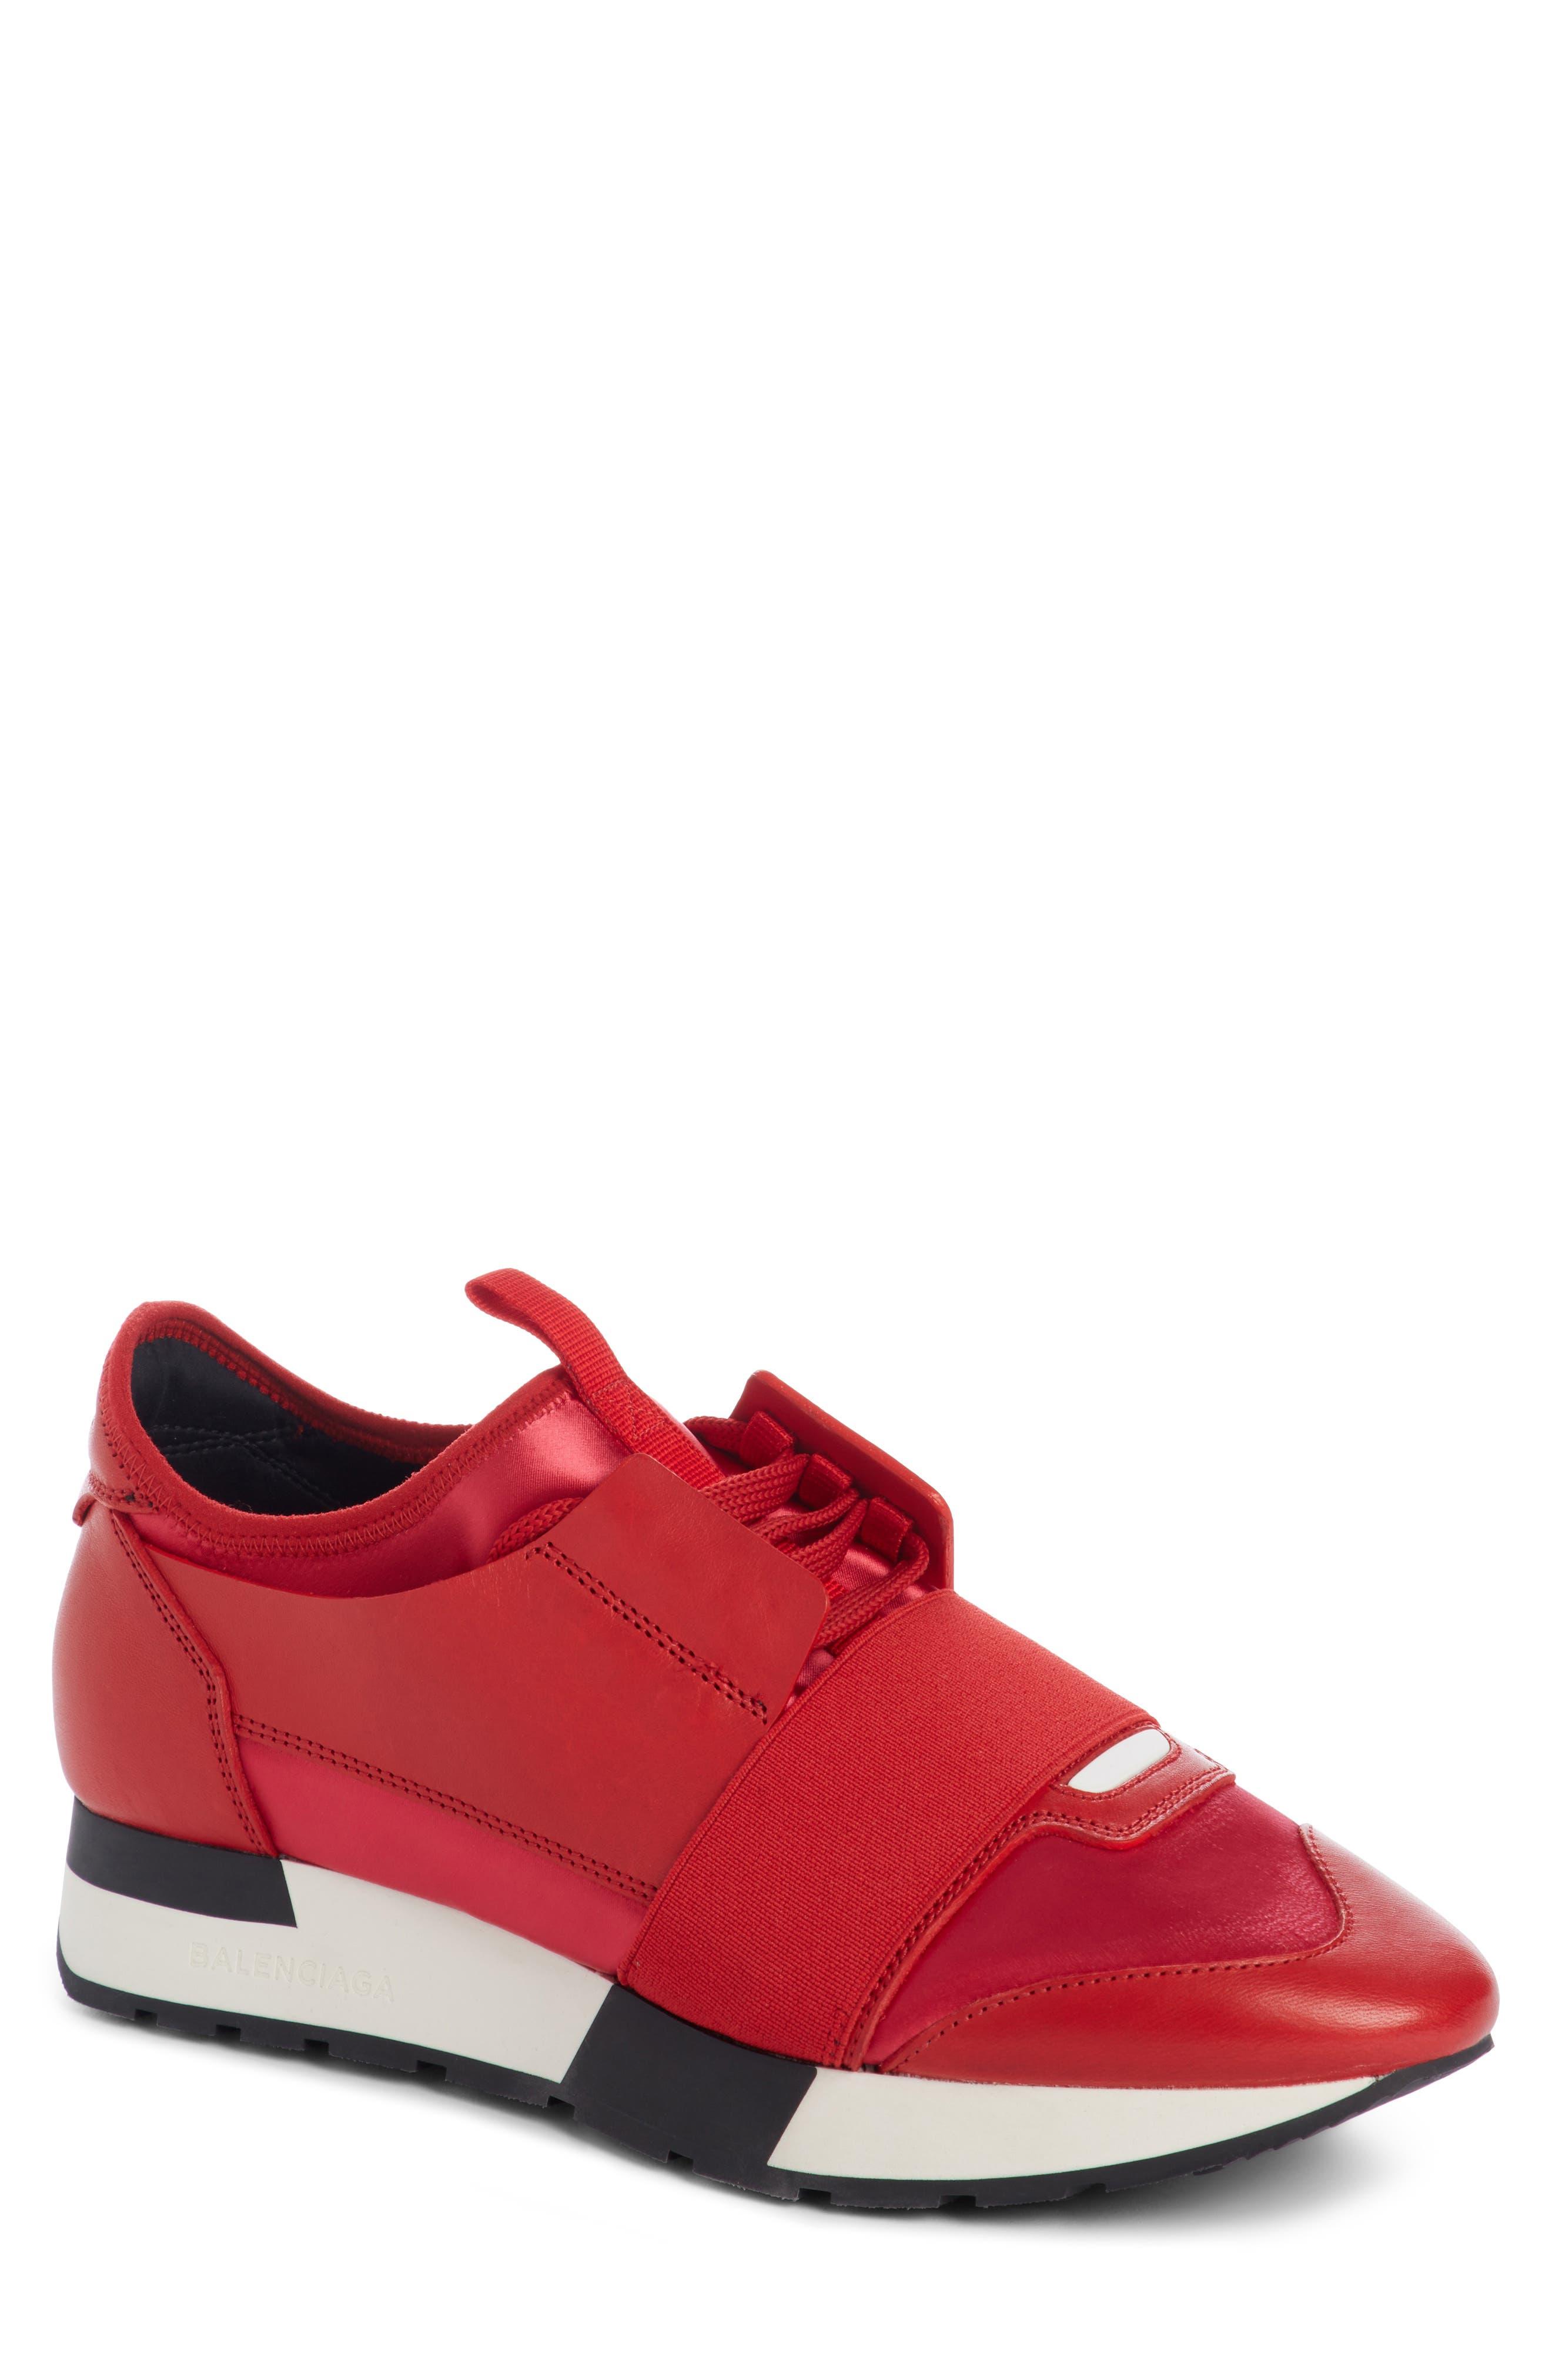 Alternate Image 1 Selected - Balenciaga Mixed Media Trainer Sneaker (Women)